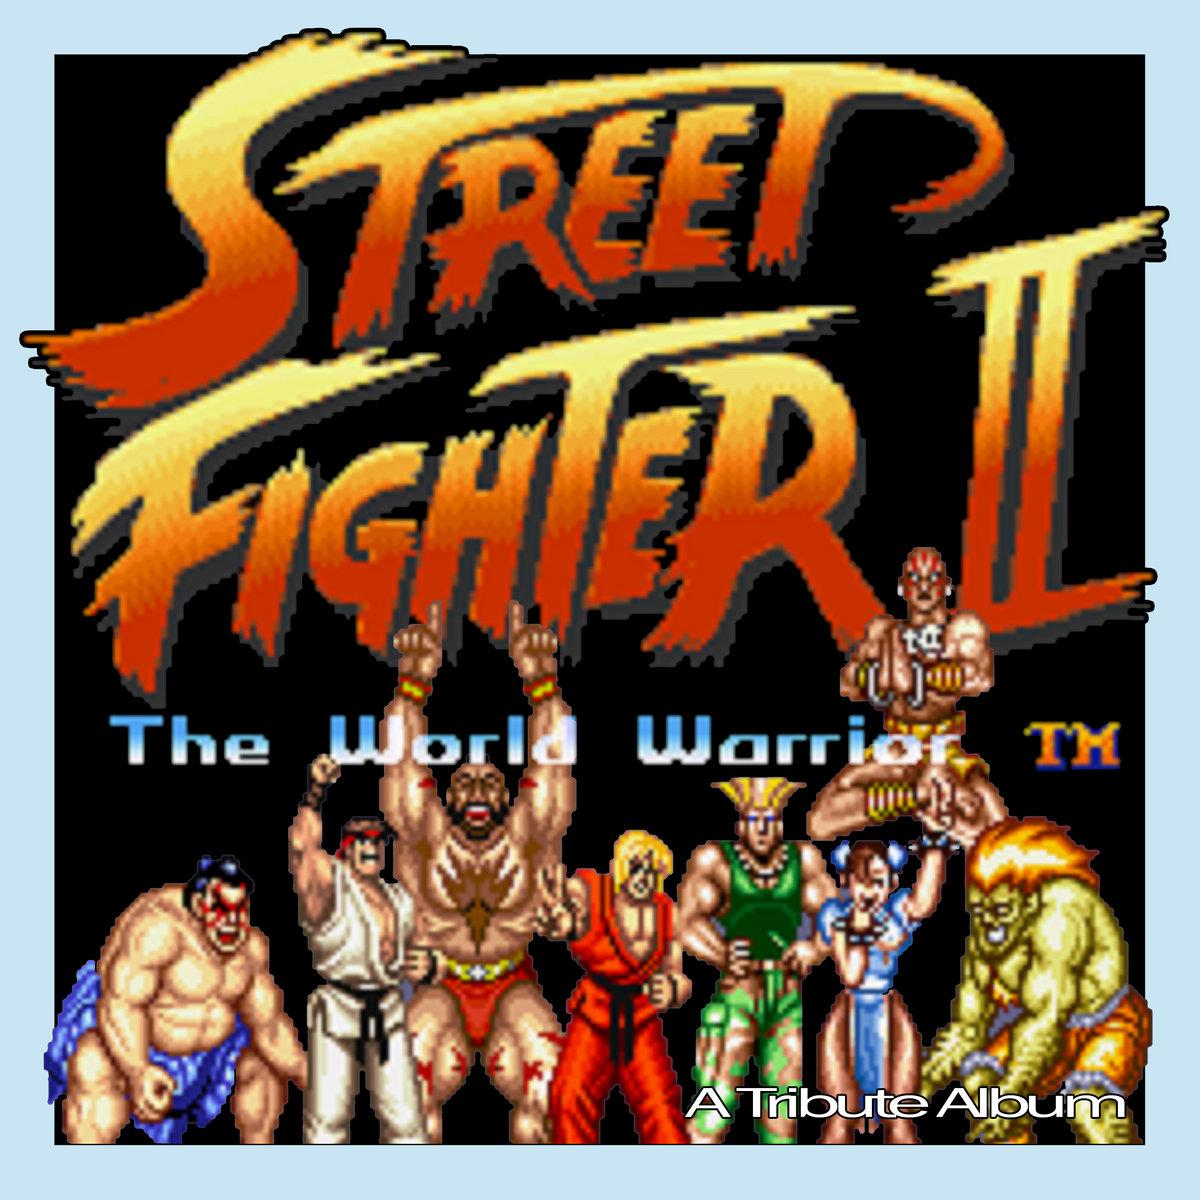 Street Fighter 2: The World Warrior: A Tribute Album | Yoga